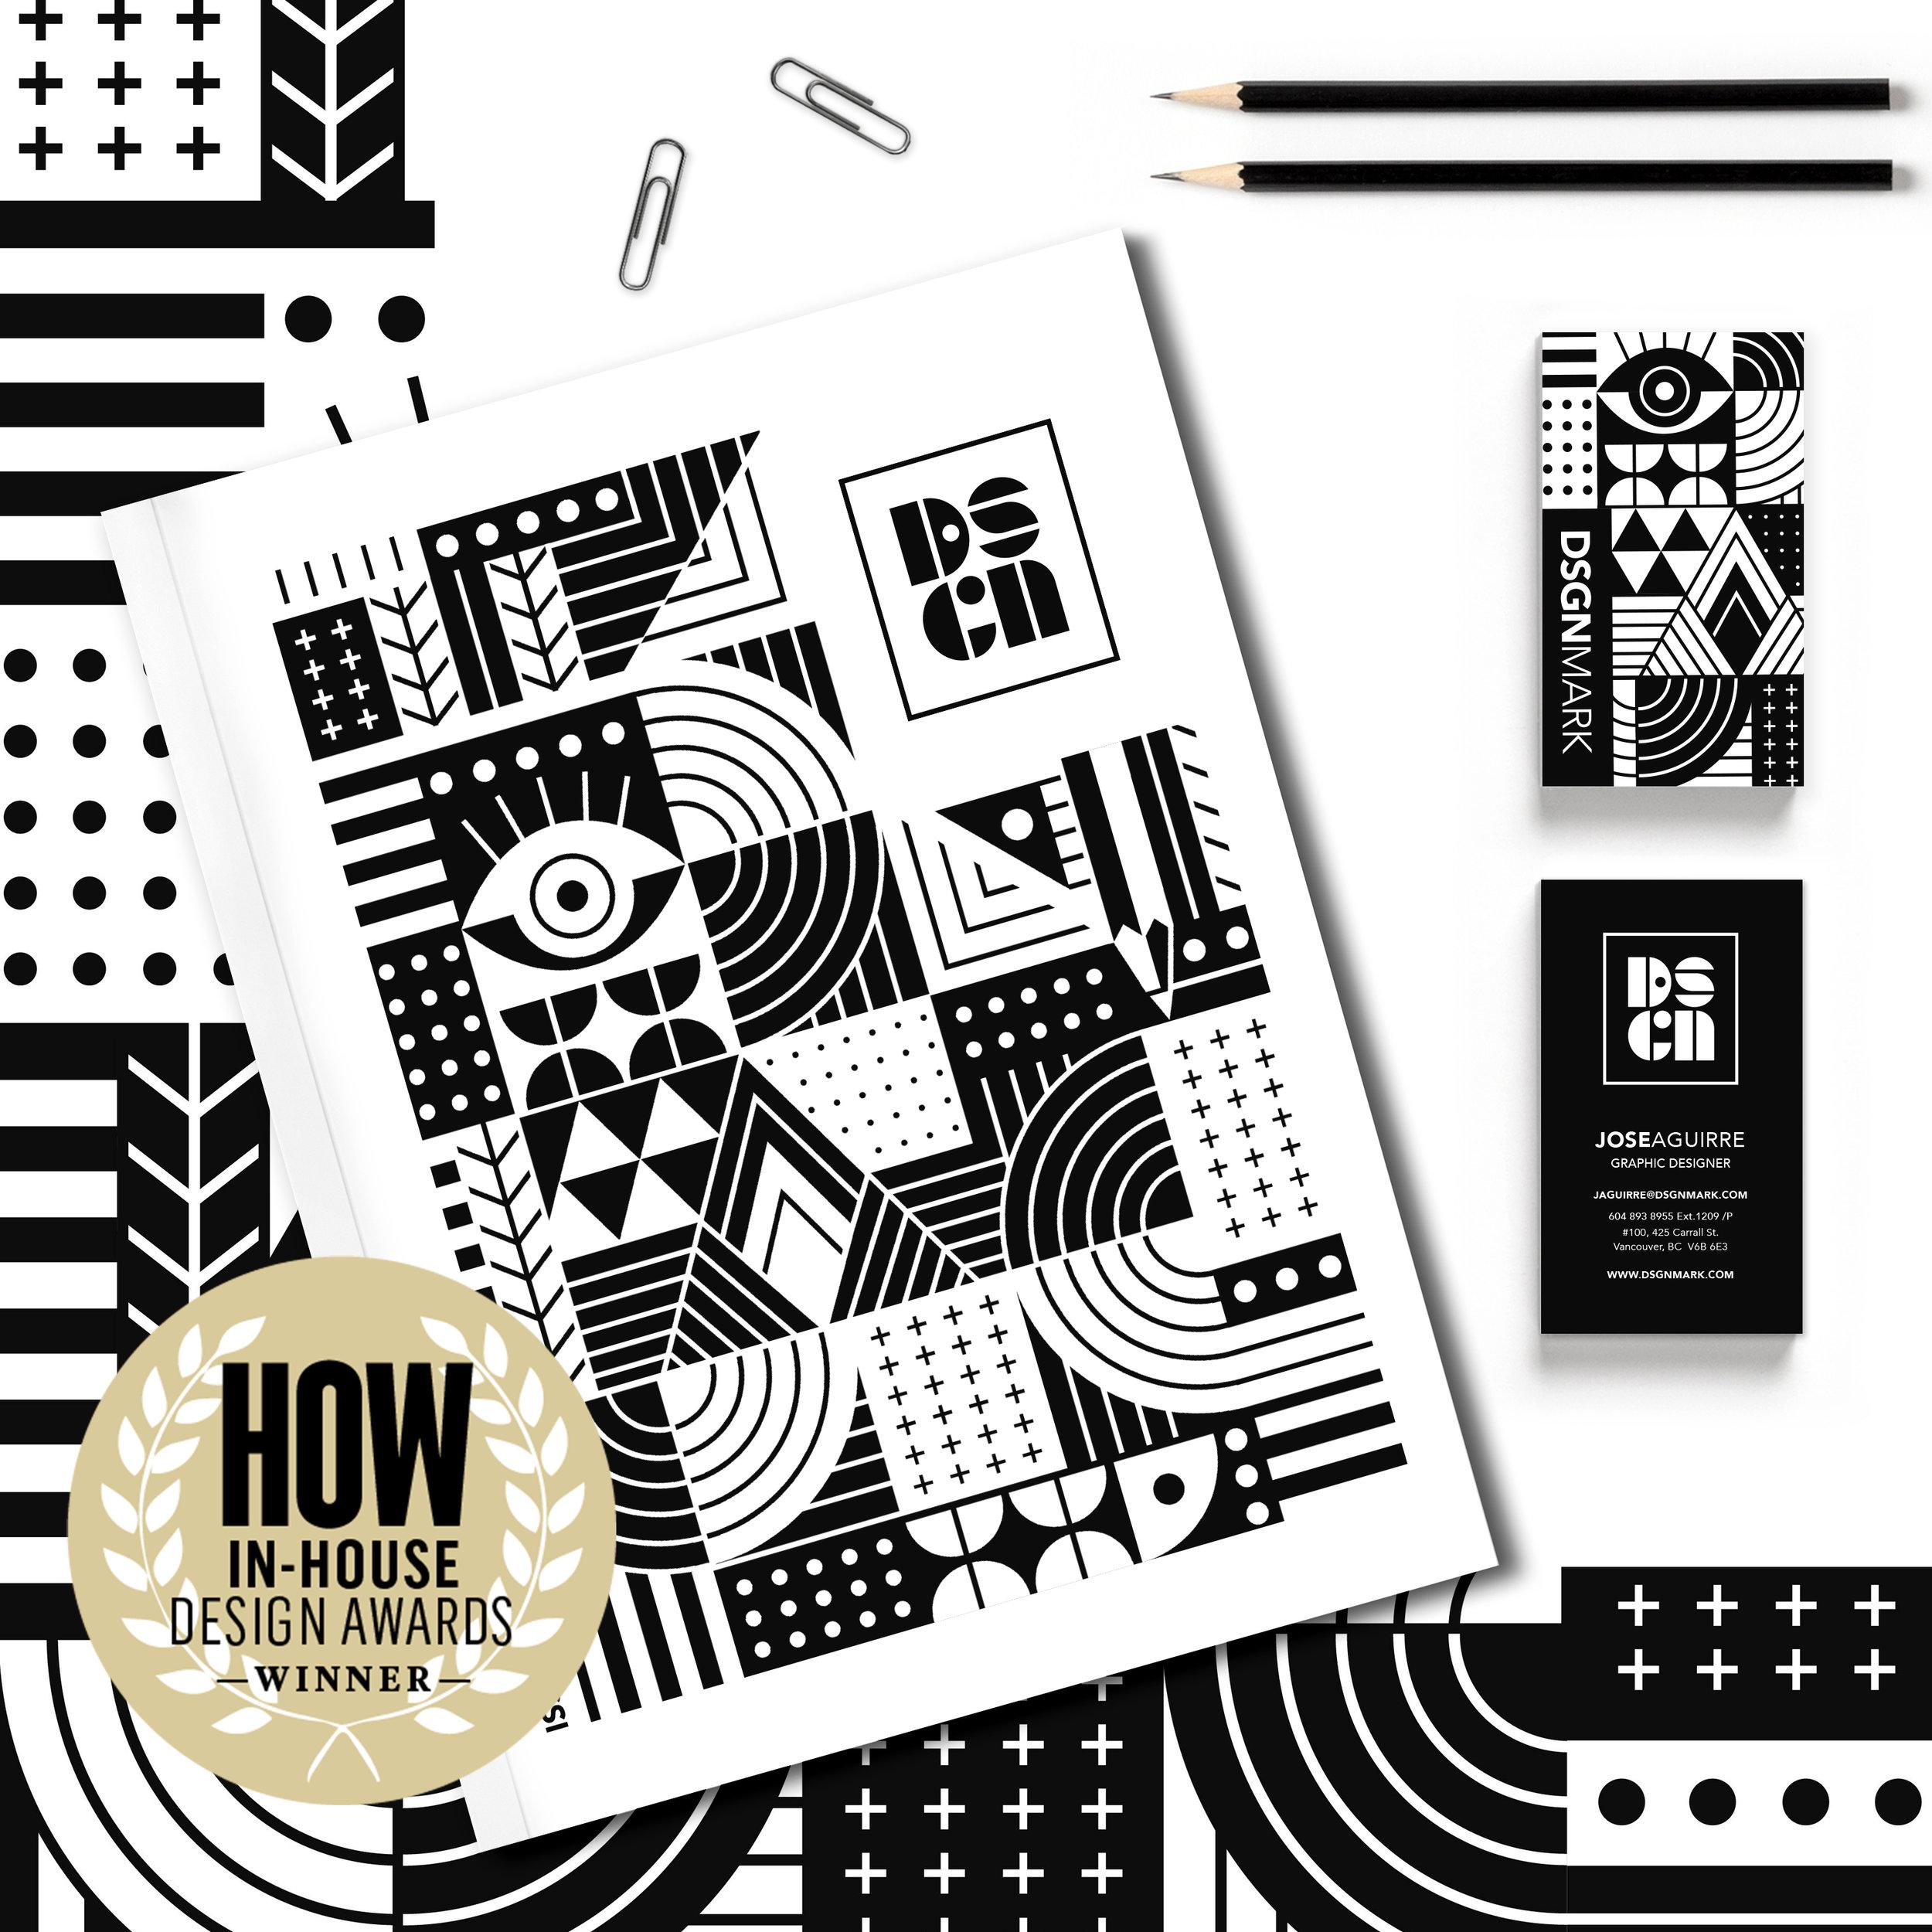 branding-HowDesign.jpg